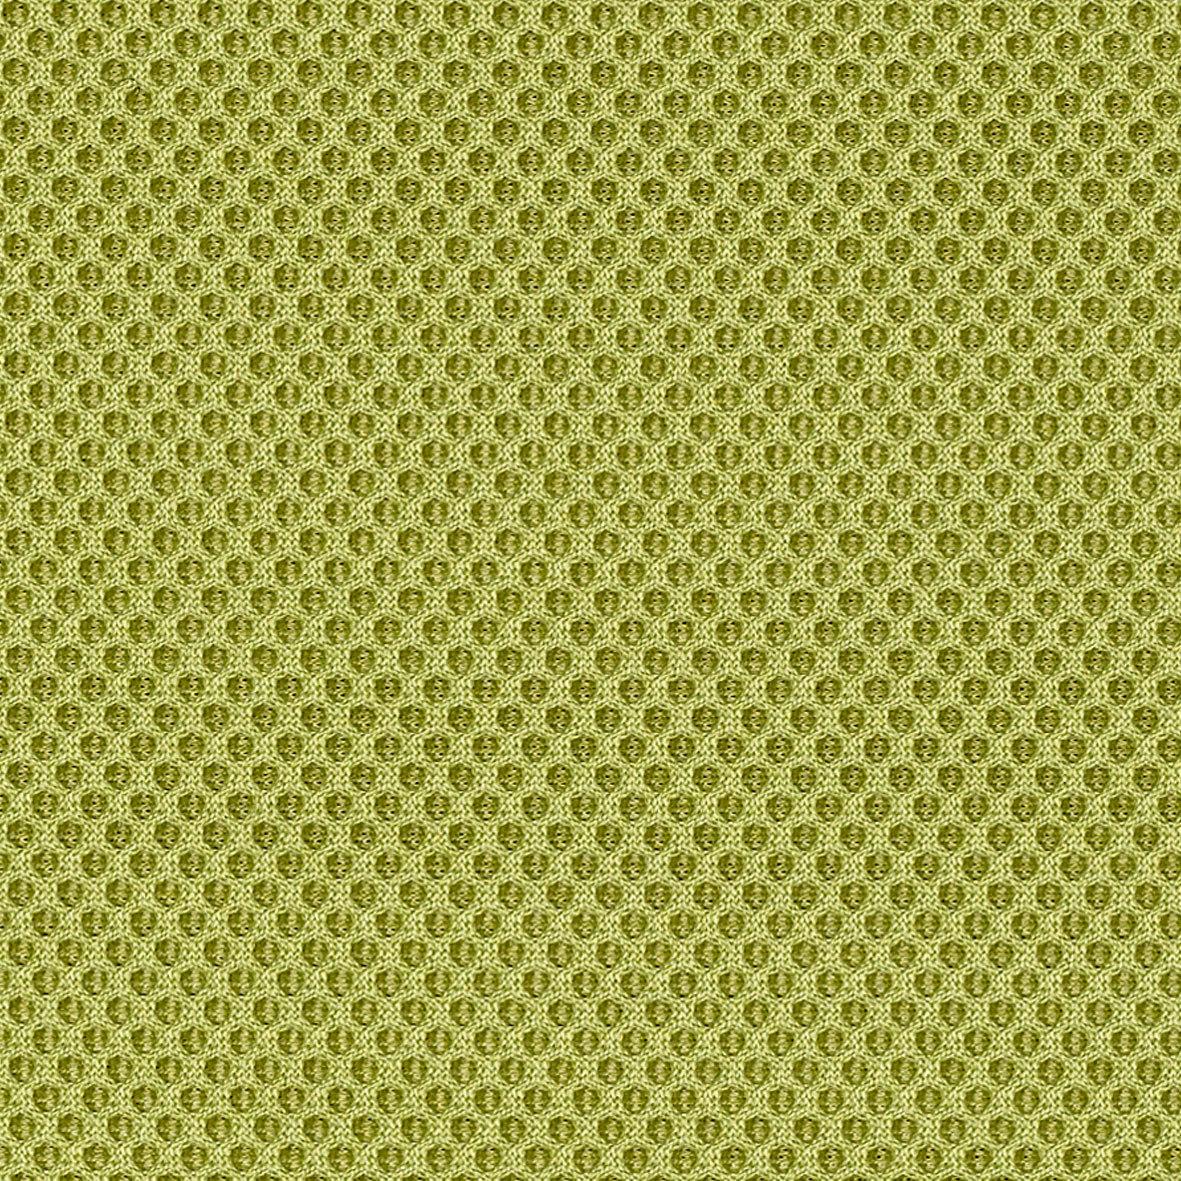 RR05 Light Green